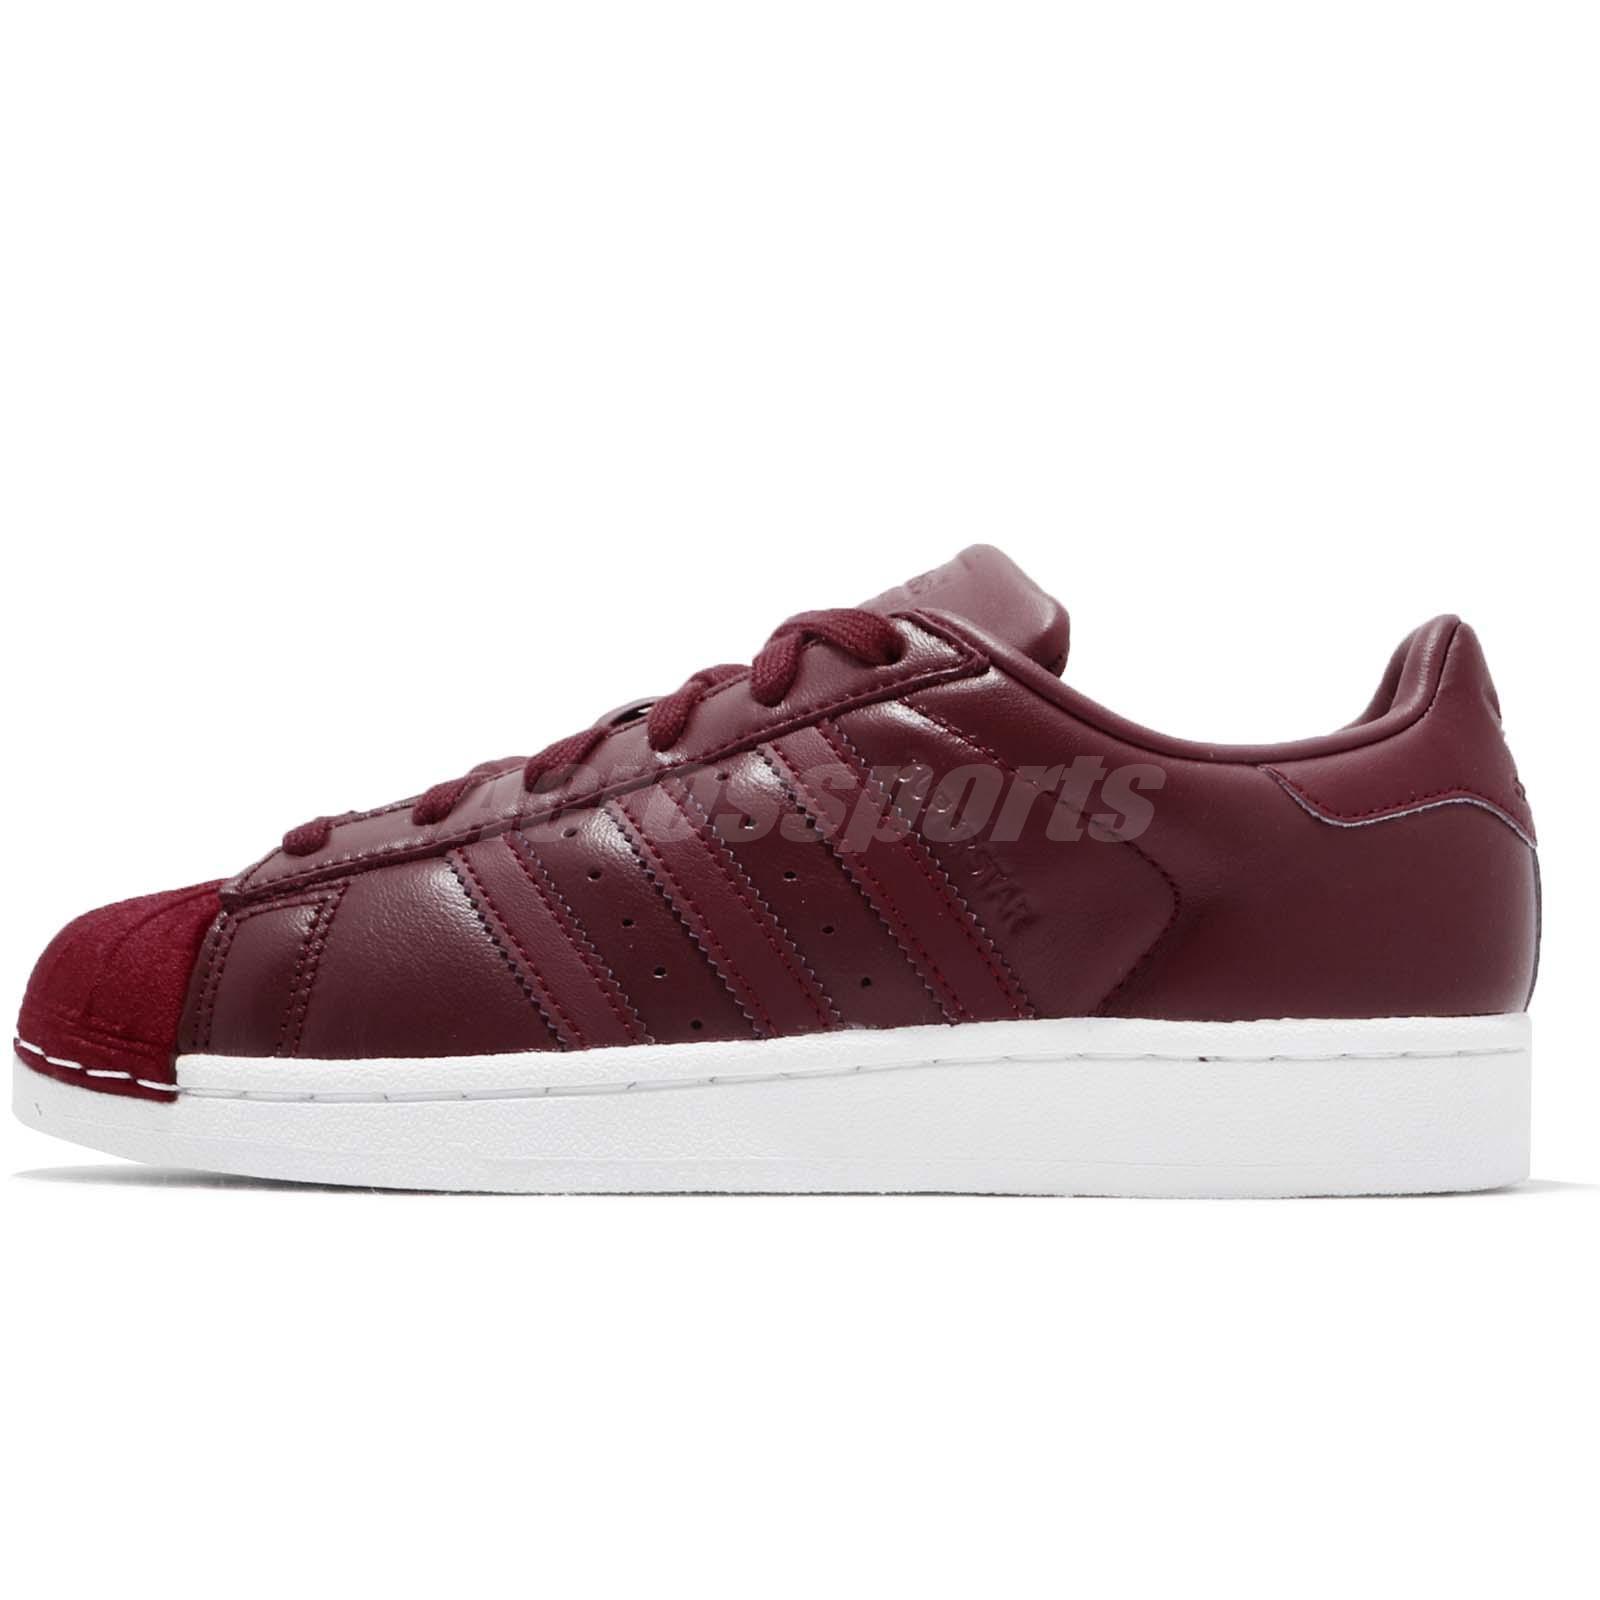 b0ed432d6299d9 Details about adidas Originals Superstar W Collegiate Burgundy Women Shoes  Sneakers BZ0644